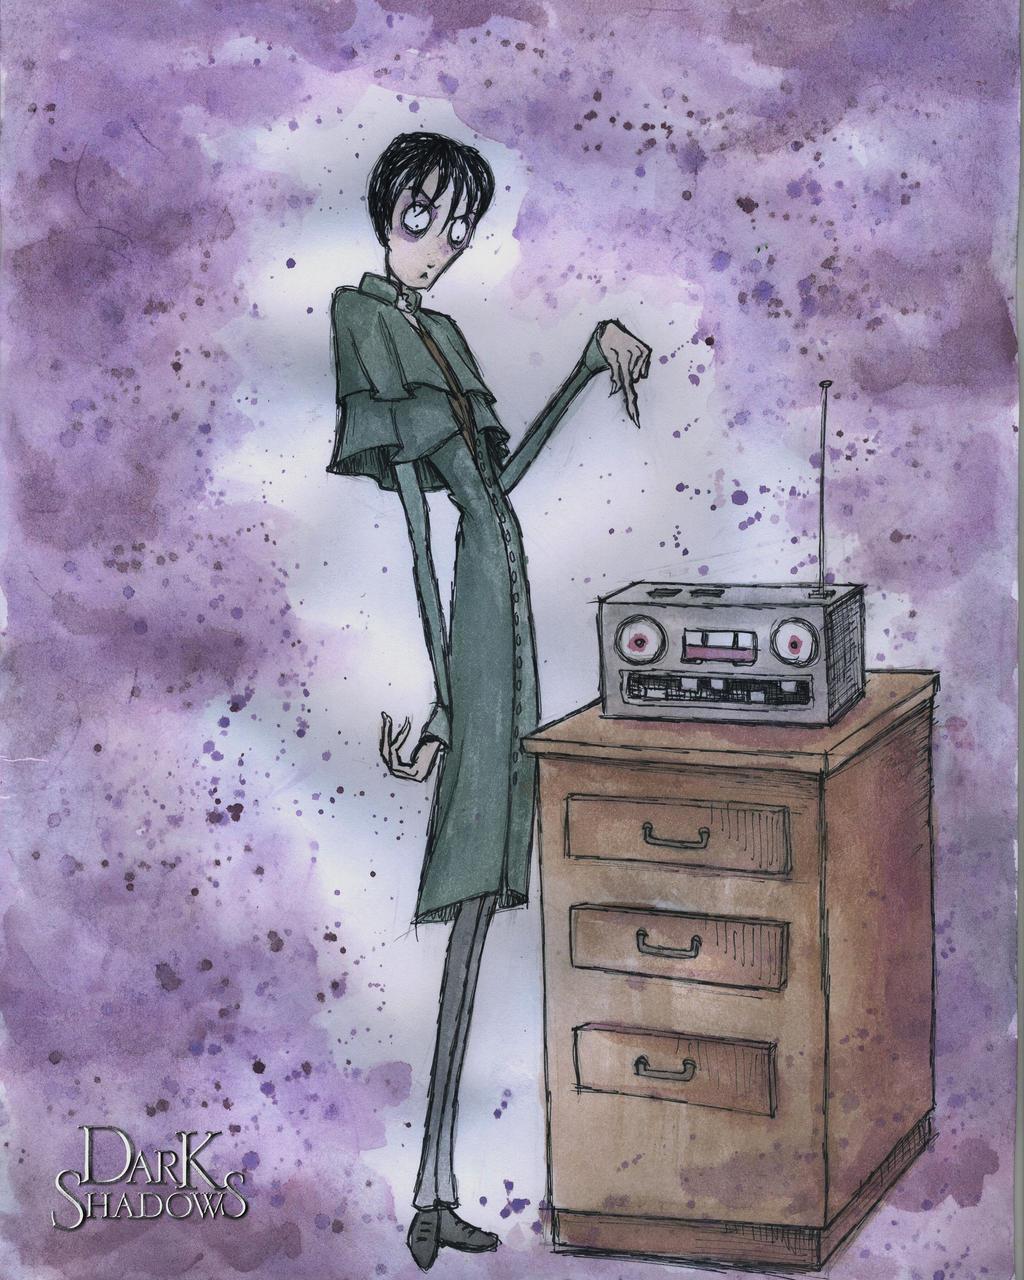 Barnabas and the Demon Radio by Tsubasa-Shou